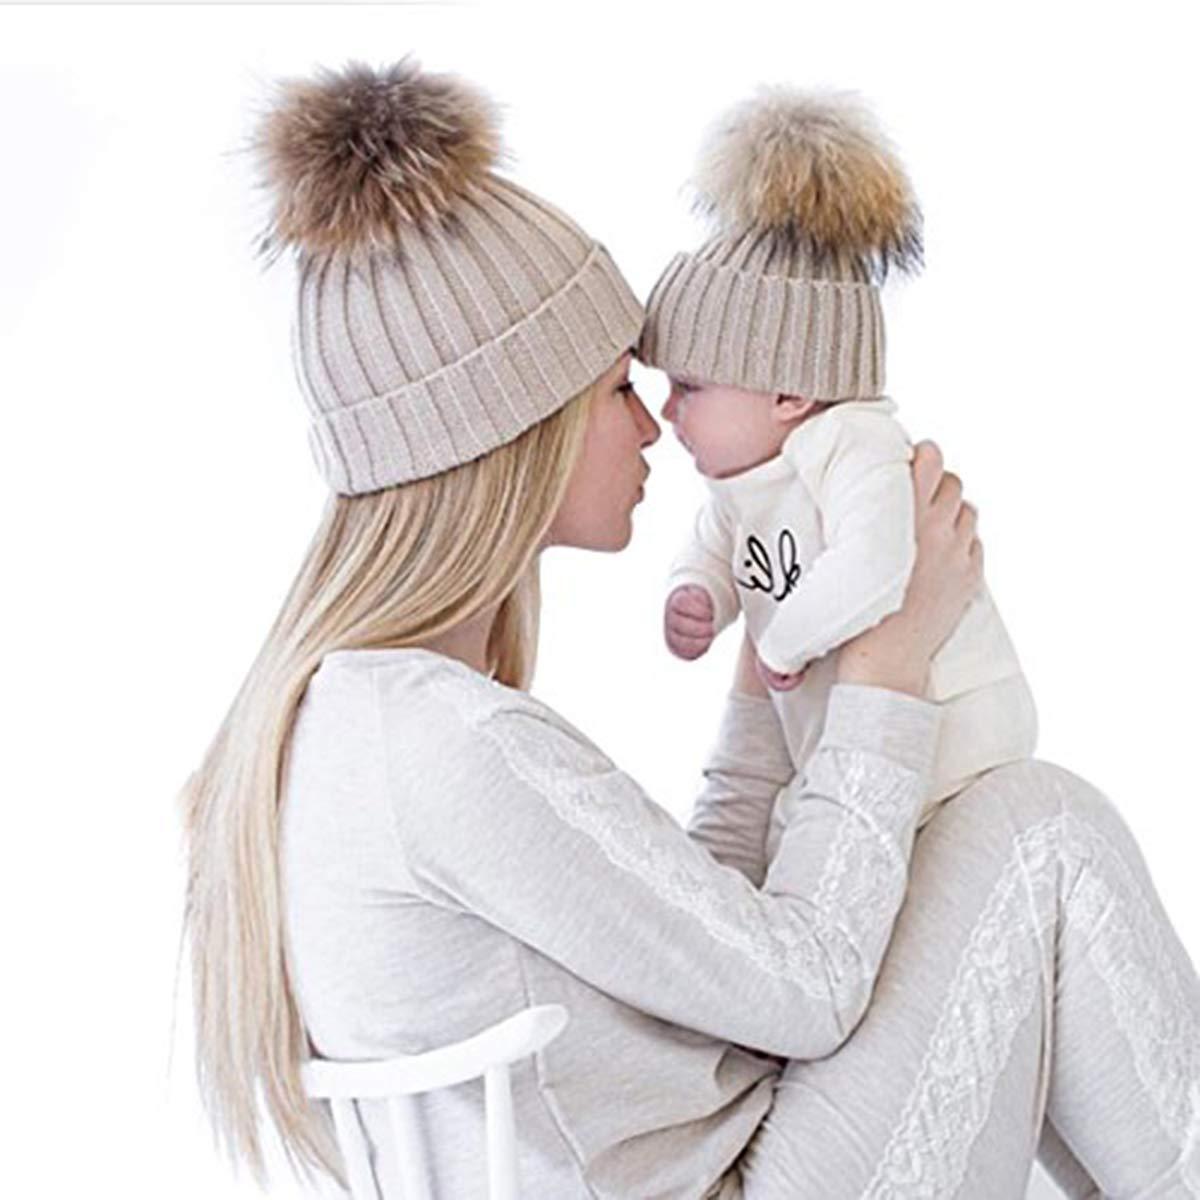 oenbopo 2PCS Parent-Child Hat Warmer Mother & Baby Daughter/Son Winter Warm Knit Hat Family Crochet Beanie Ski Cap